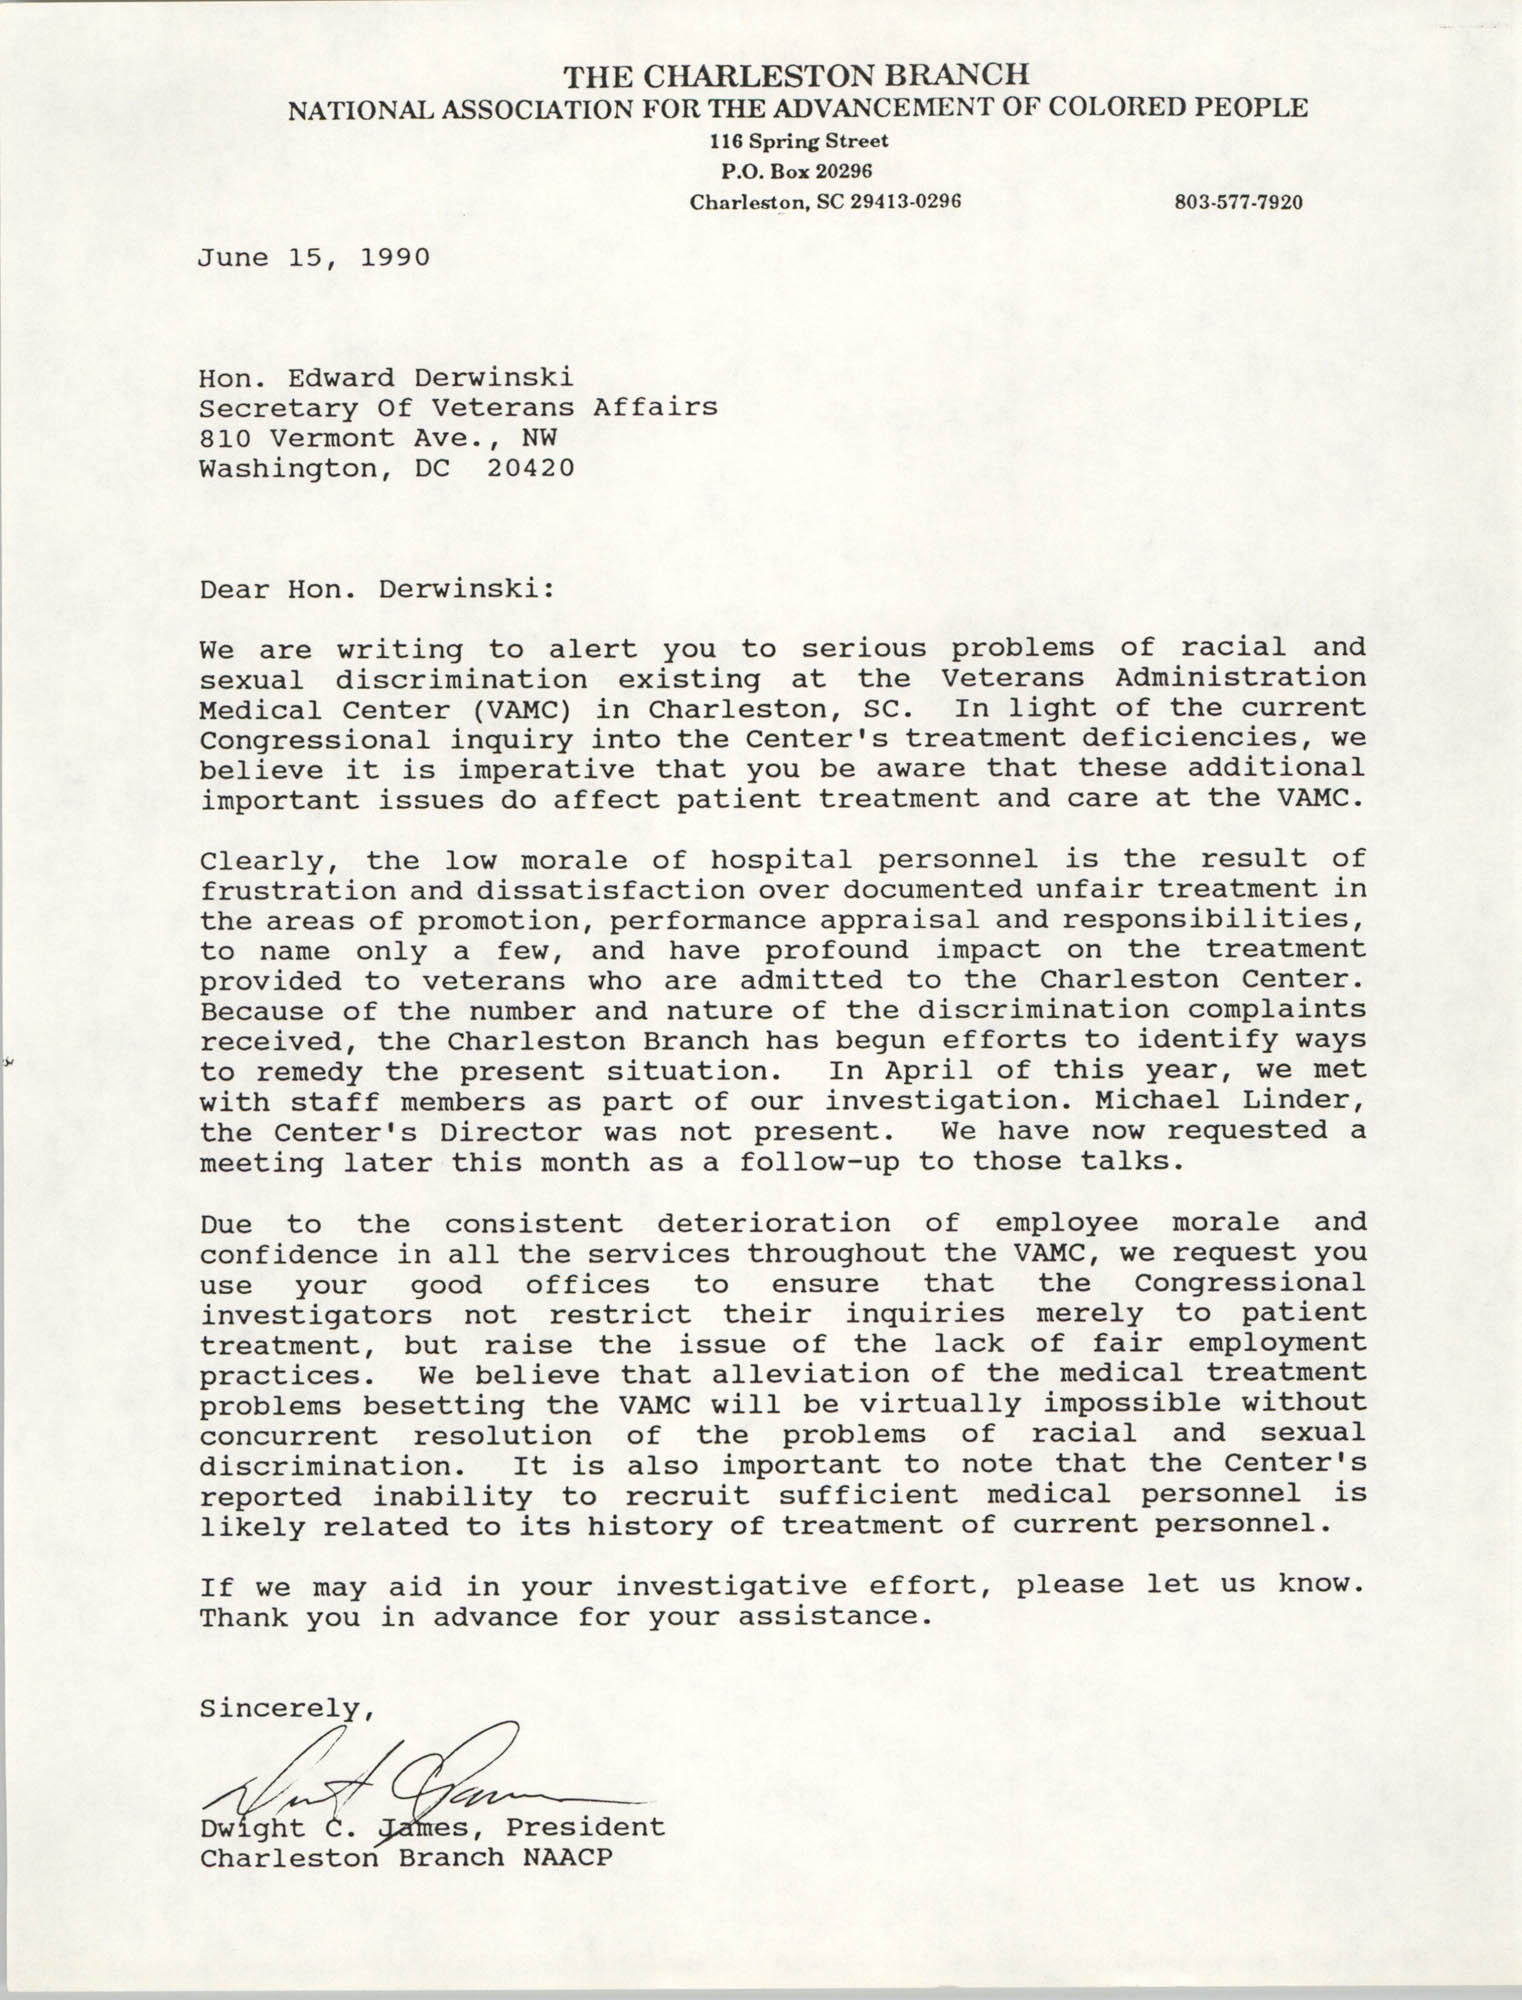 Letter from Dwight C. James to Edward Derwinski, June 15, 1990